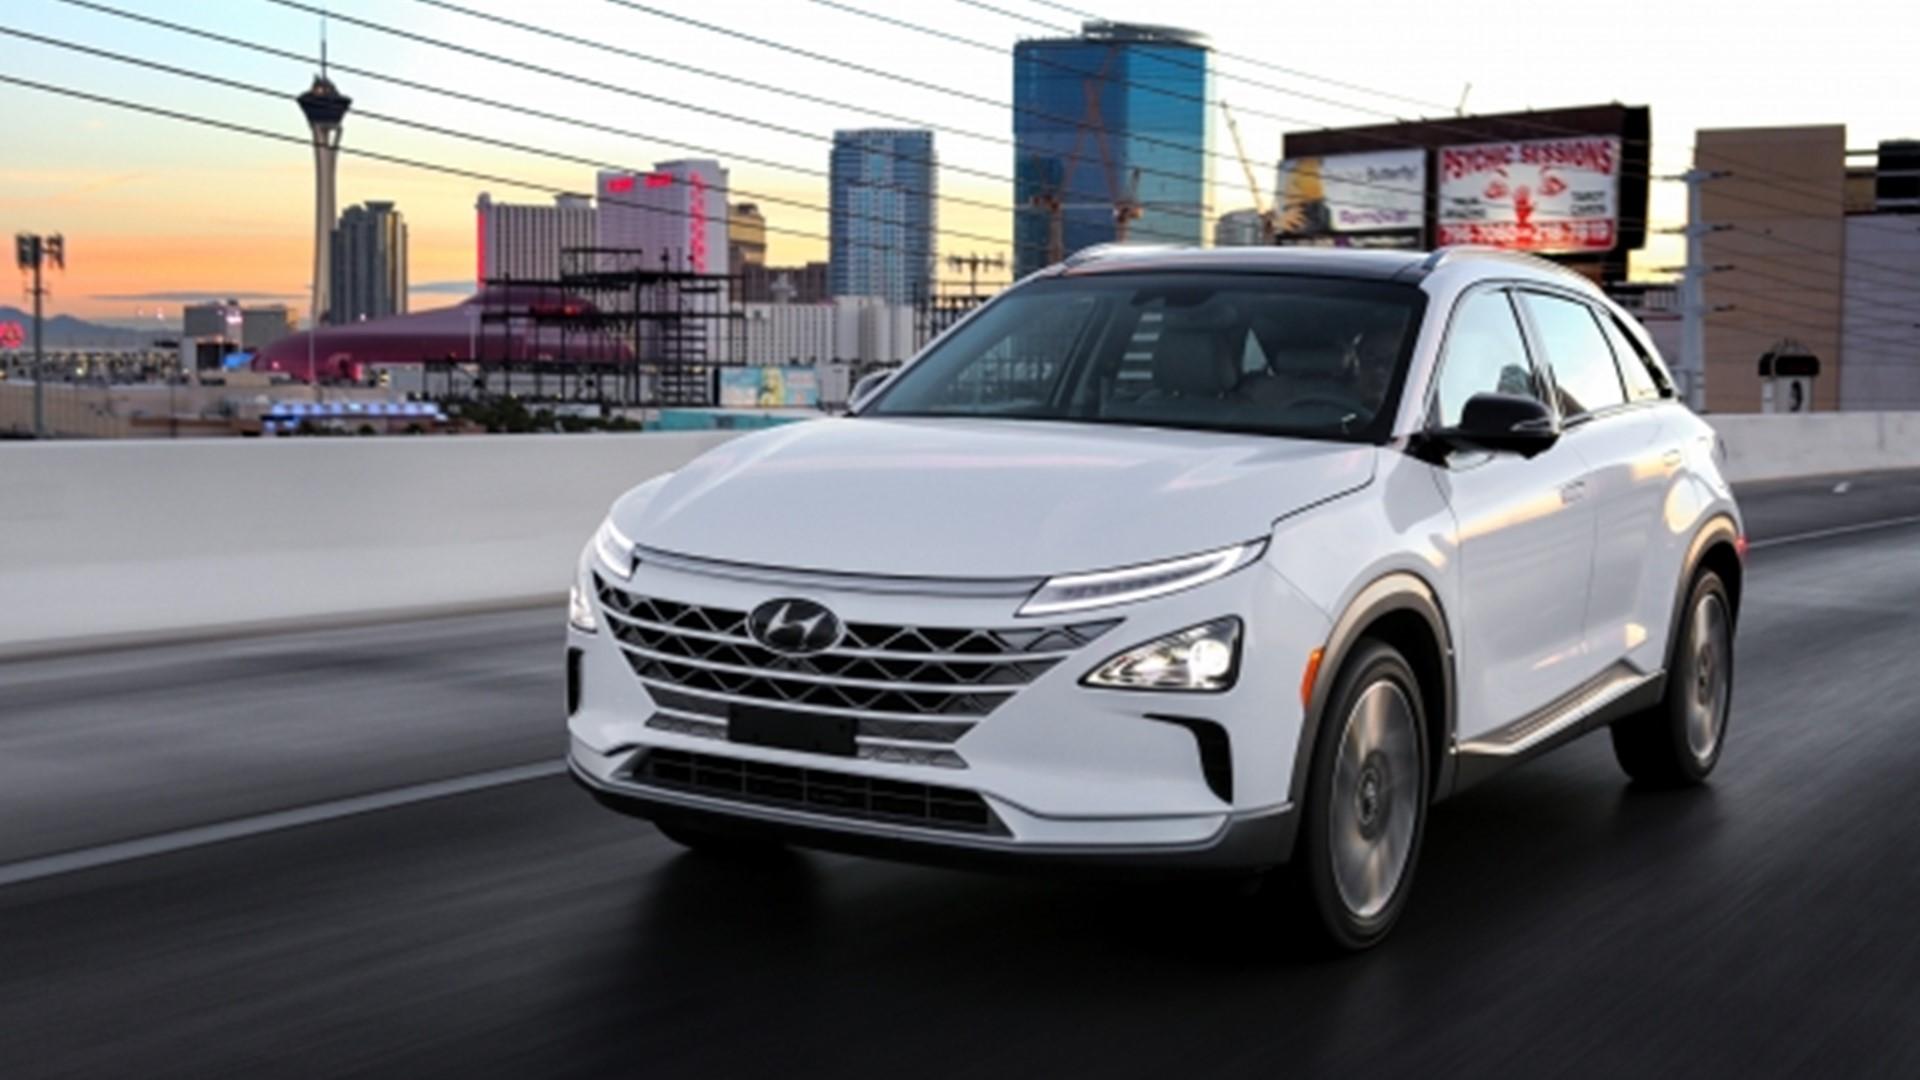 Hyundai Unveils Nexo Its Next Generation FCEV autoTRADERca 1920x1080